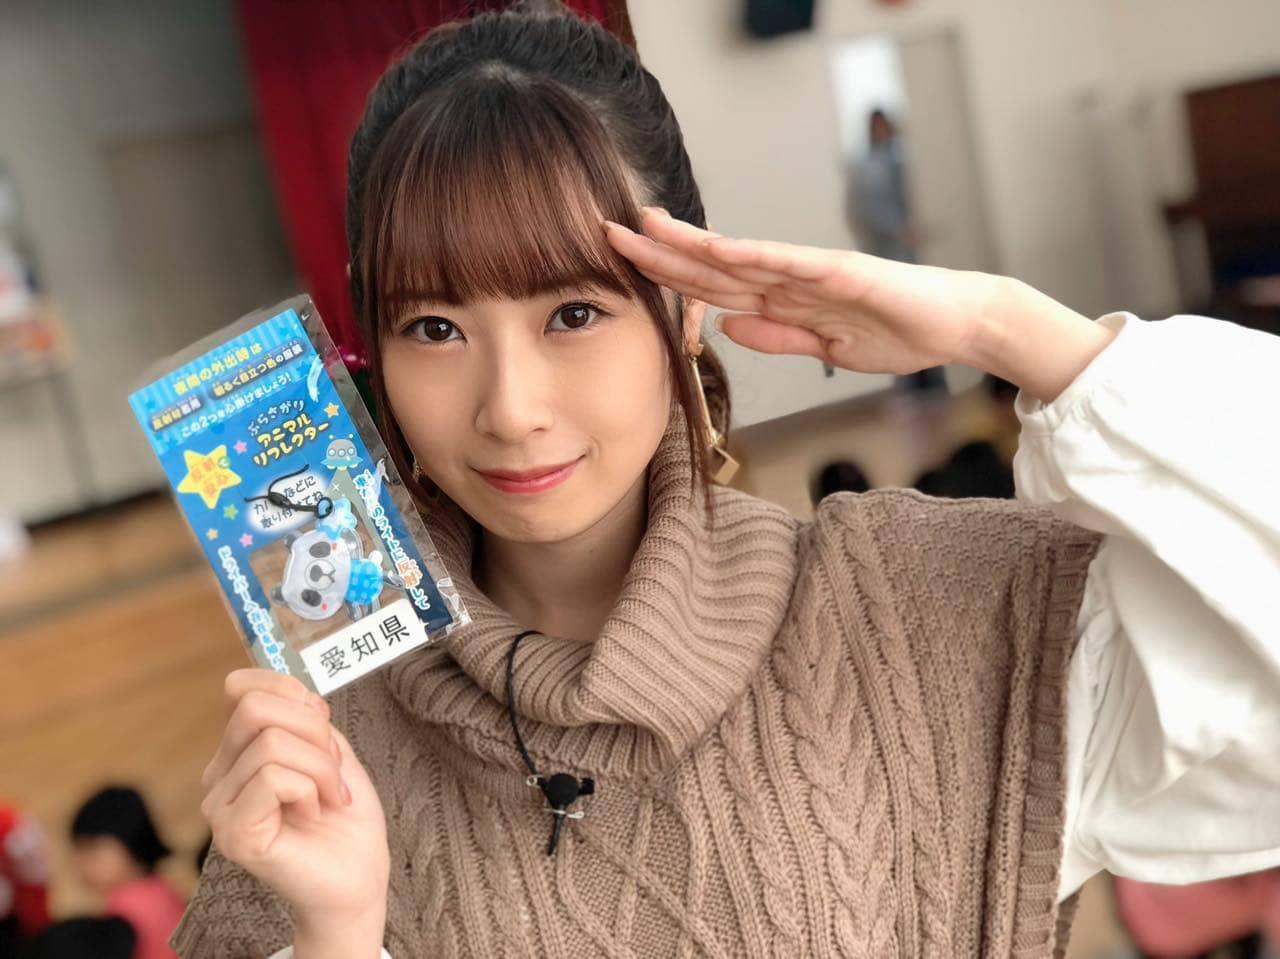 「SKE48のあいちテル!」高柳明音が交通安全教育ボランティアを紹介!